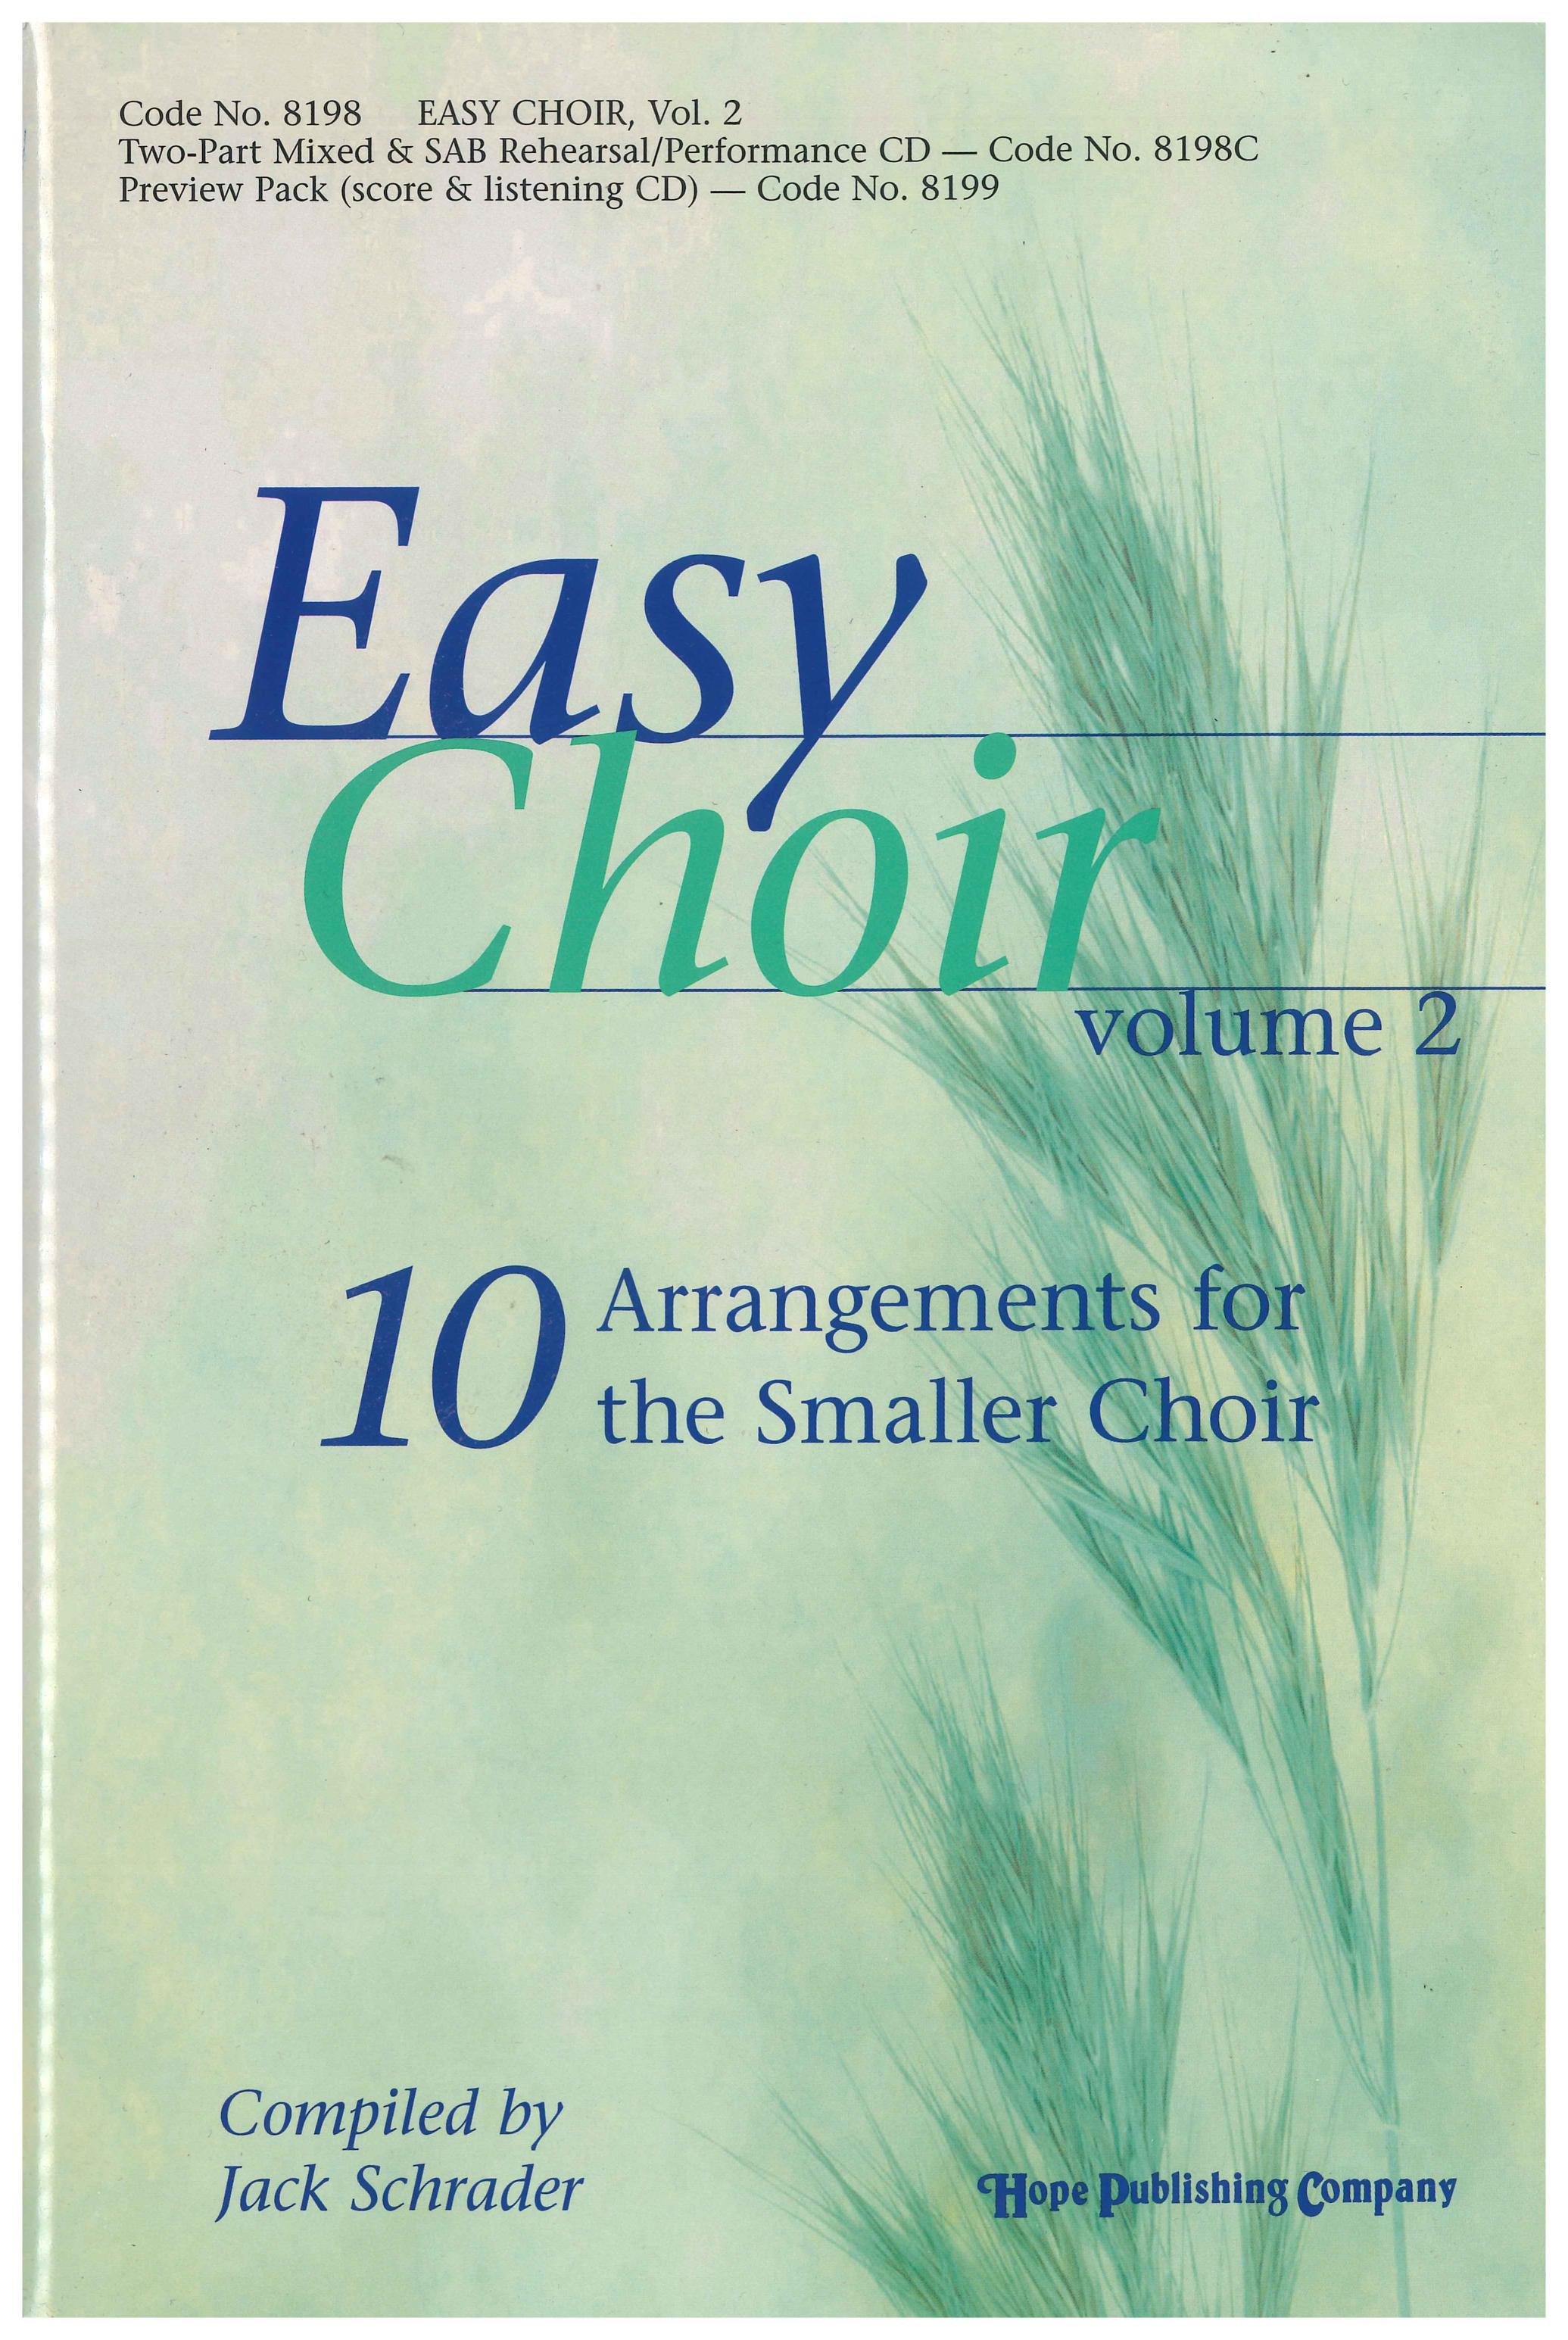 Easy Choir Vol. 2 - Score Cover Image